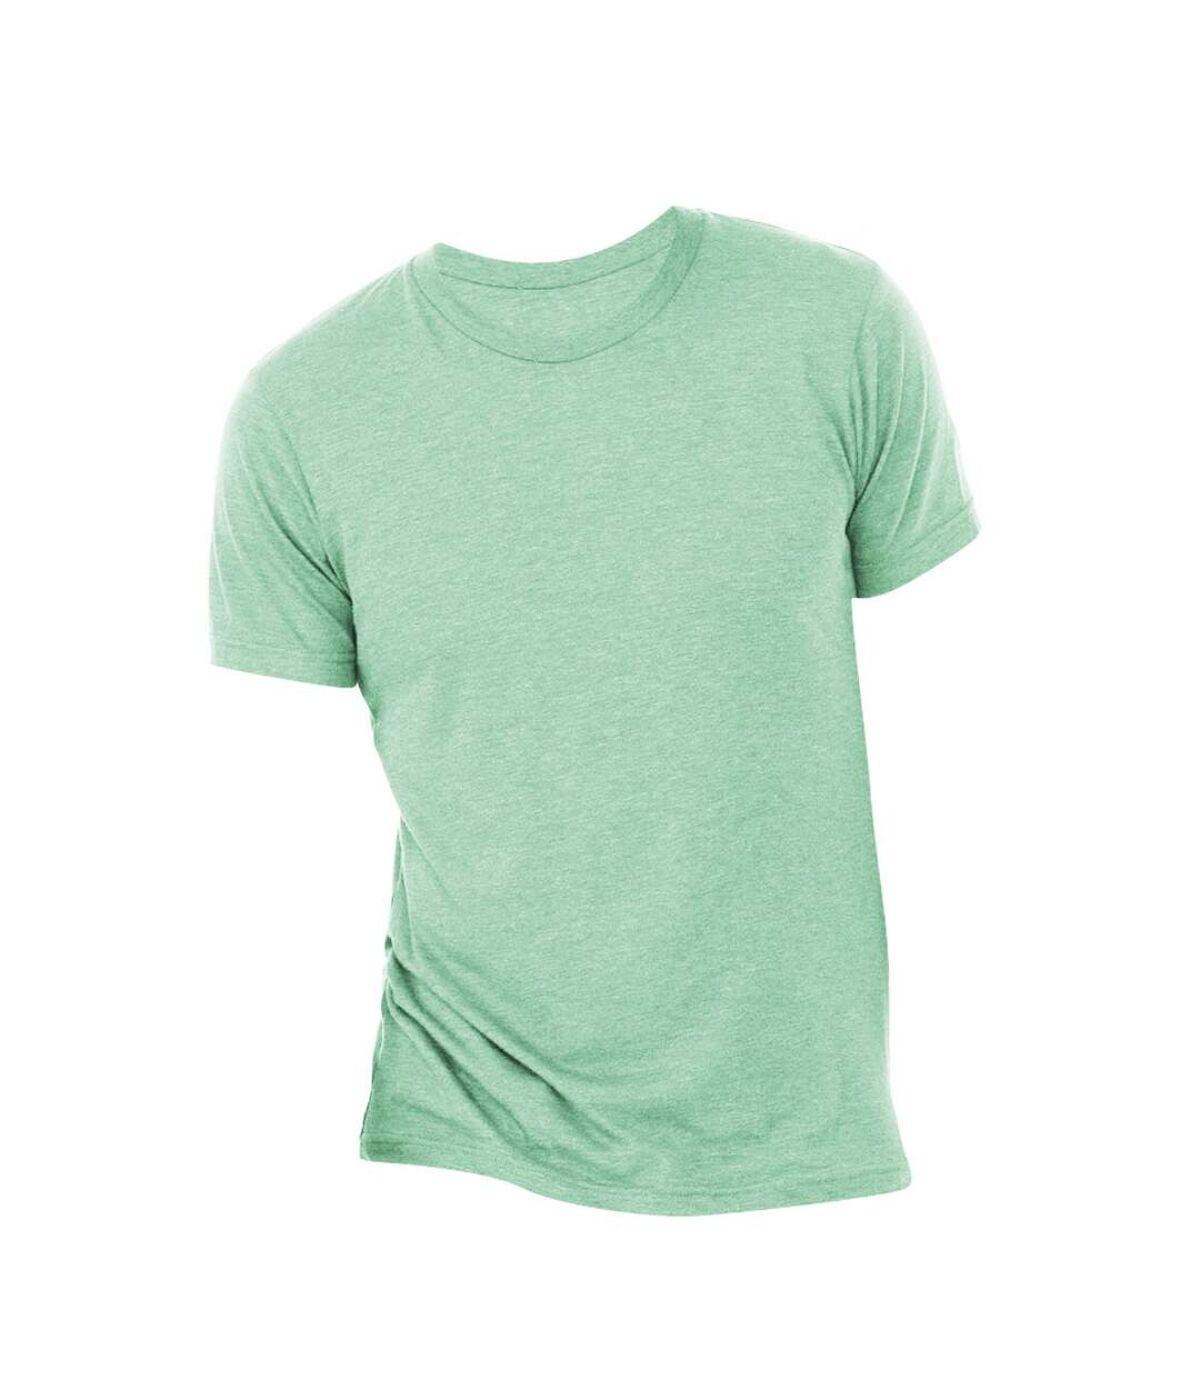 Canvas Mens Triblend Crew Neck Plain Short Sleeve T-Shirt (Mint Triblend) - UTBC2596